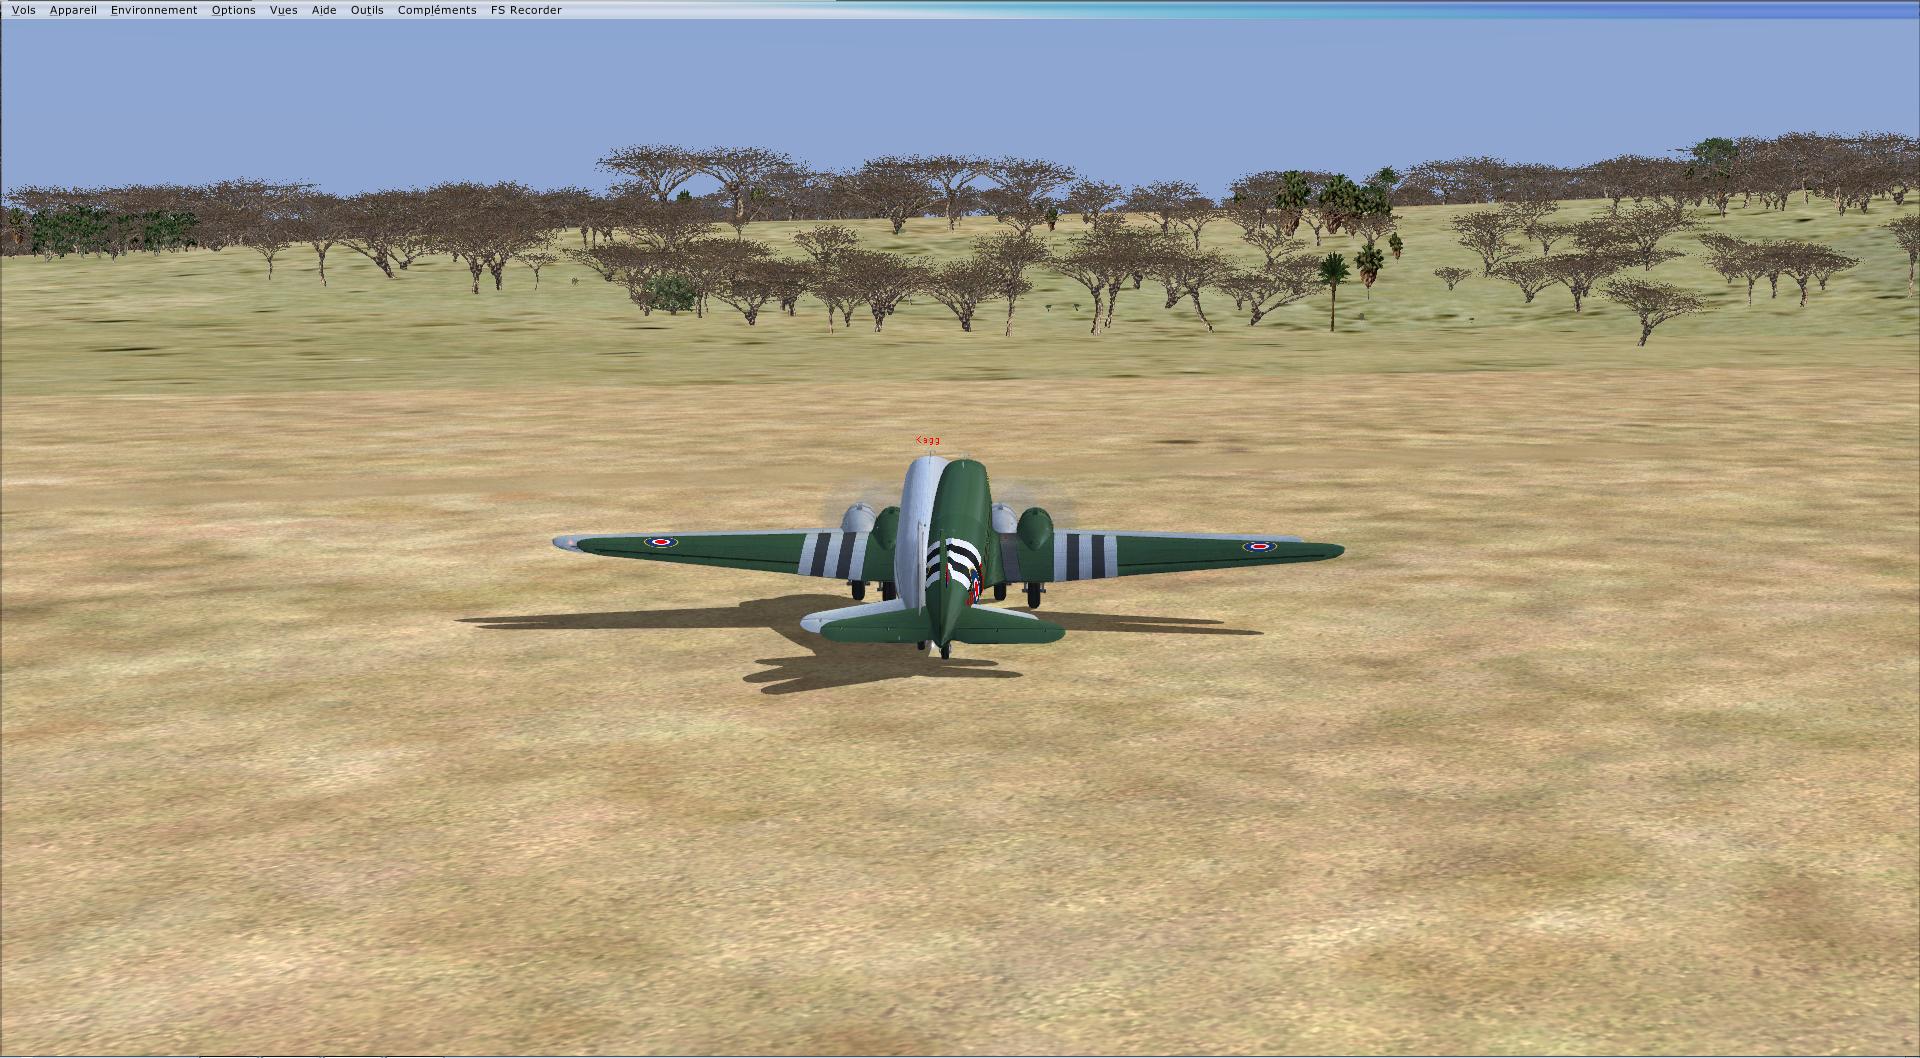 Vol en formation en Afrique (DC3) 7539732013222223534925